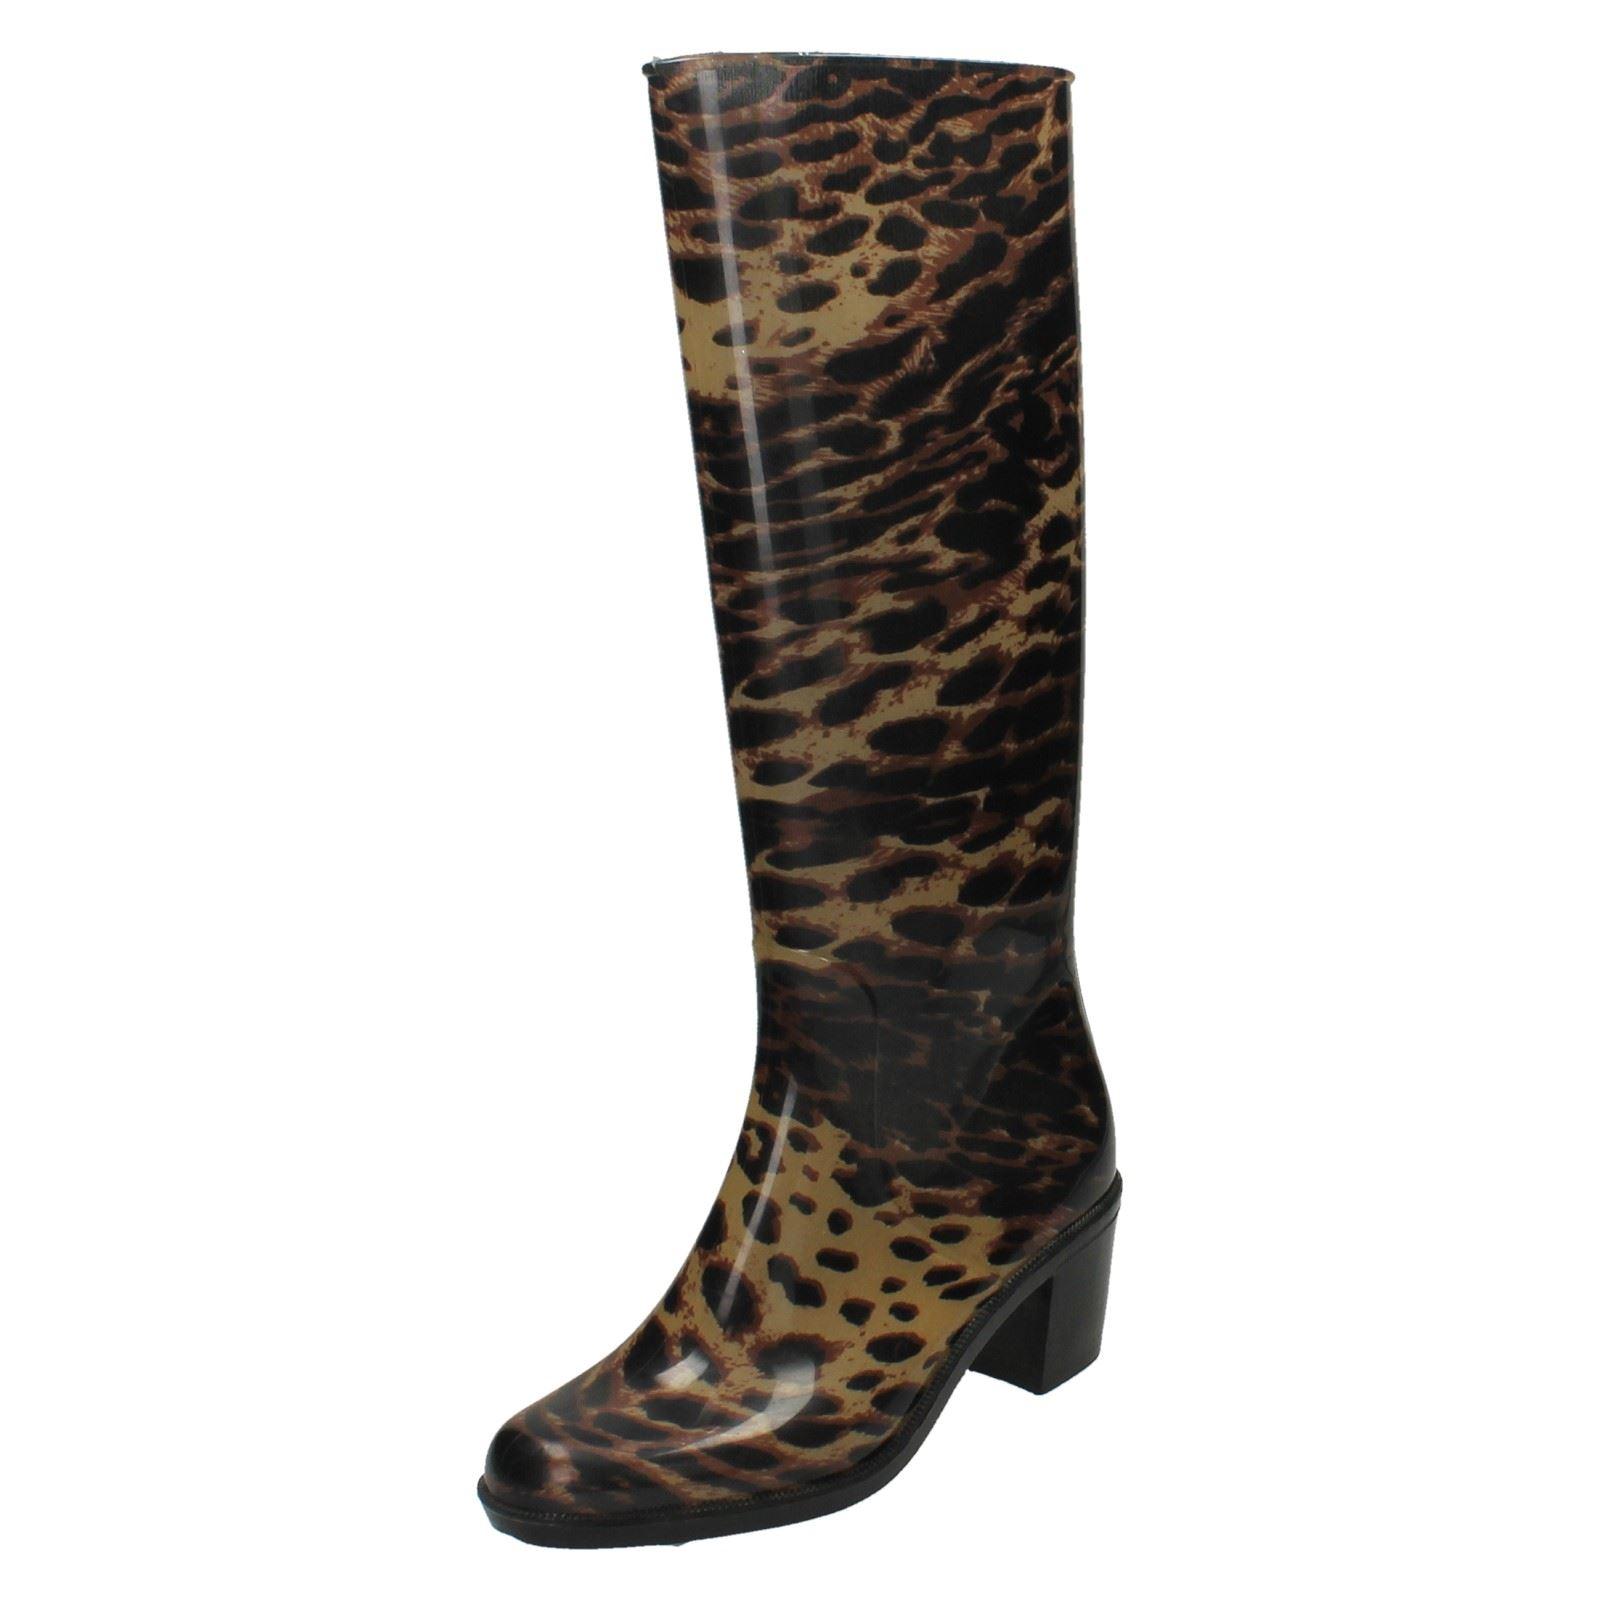 Mujer Spot On Estampado Leopardo Botas De Agua